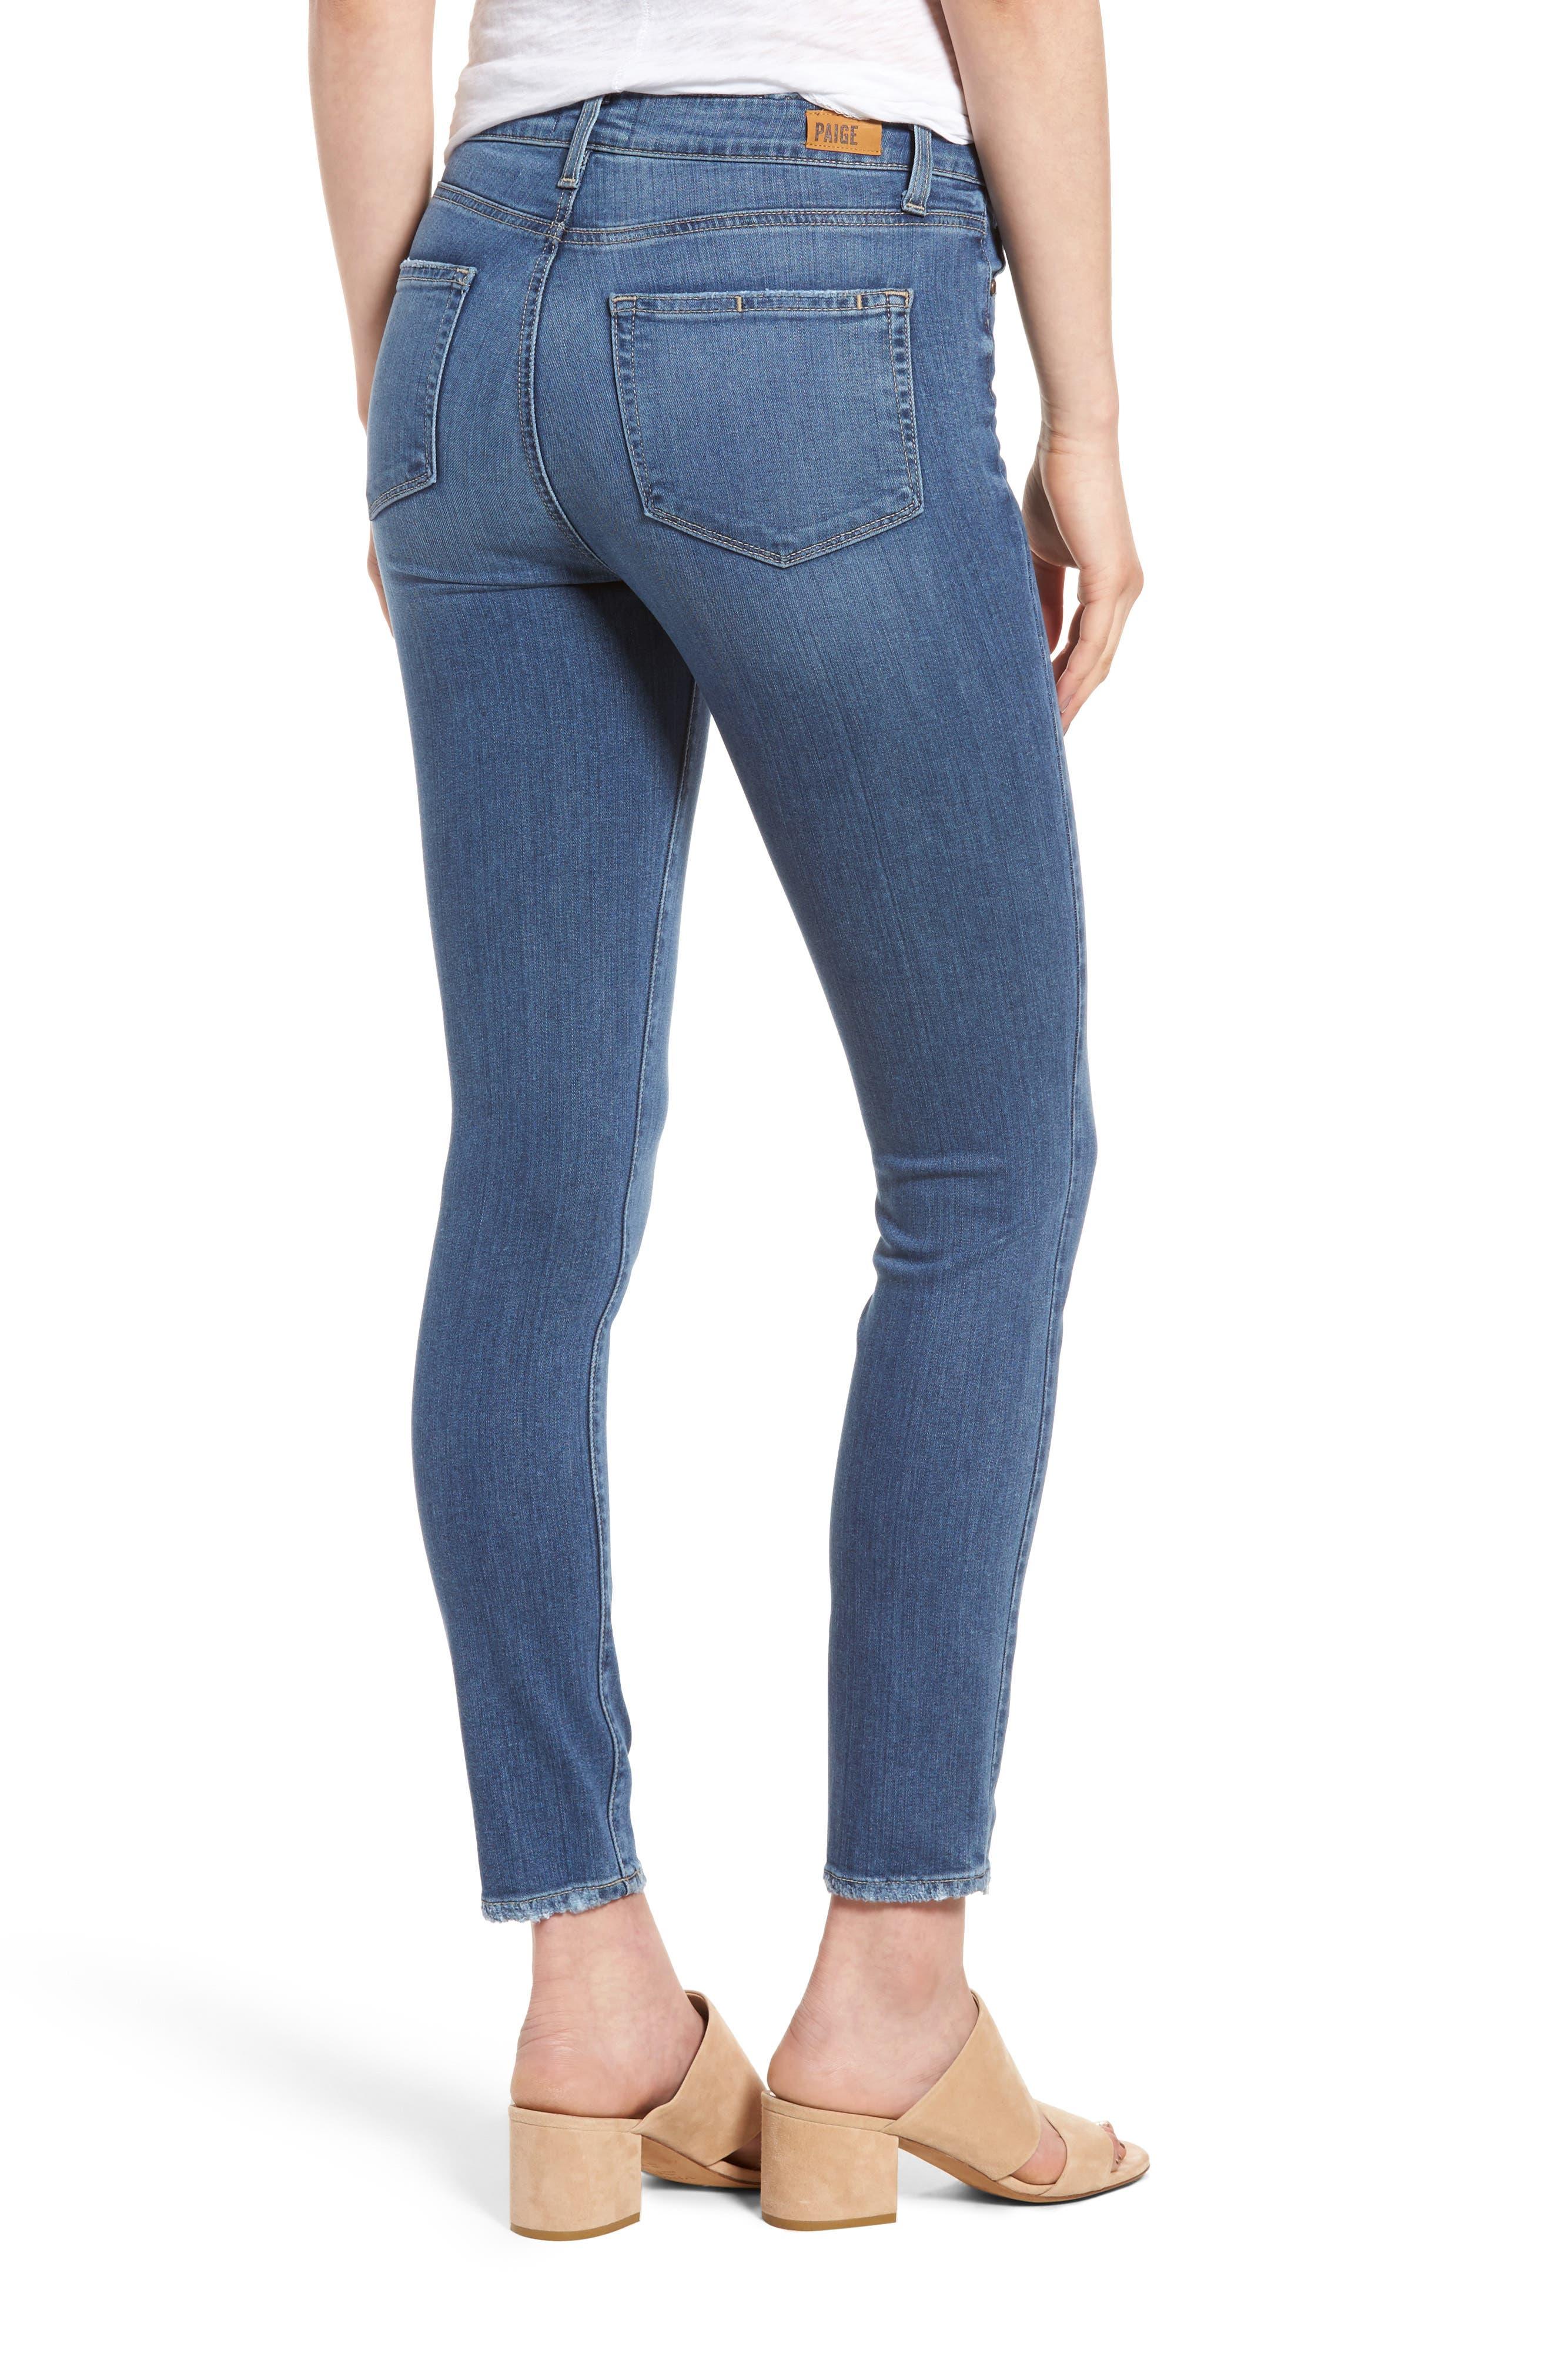 Hoxton High Waist Ankle Skinny Jeans,                             Alternate thumbnail 2, color,                             400